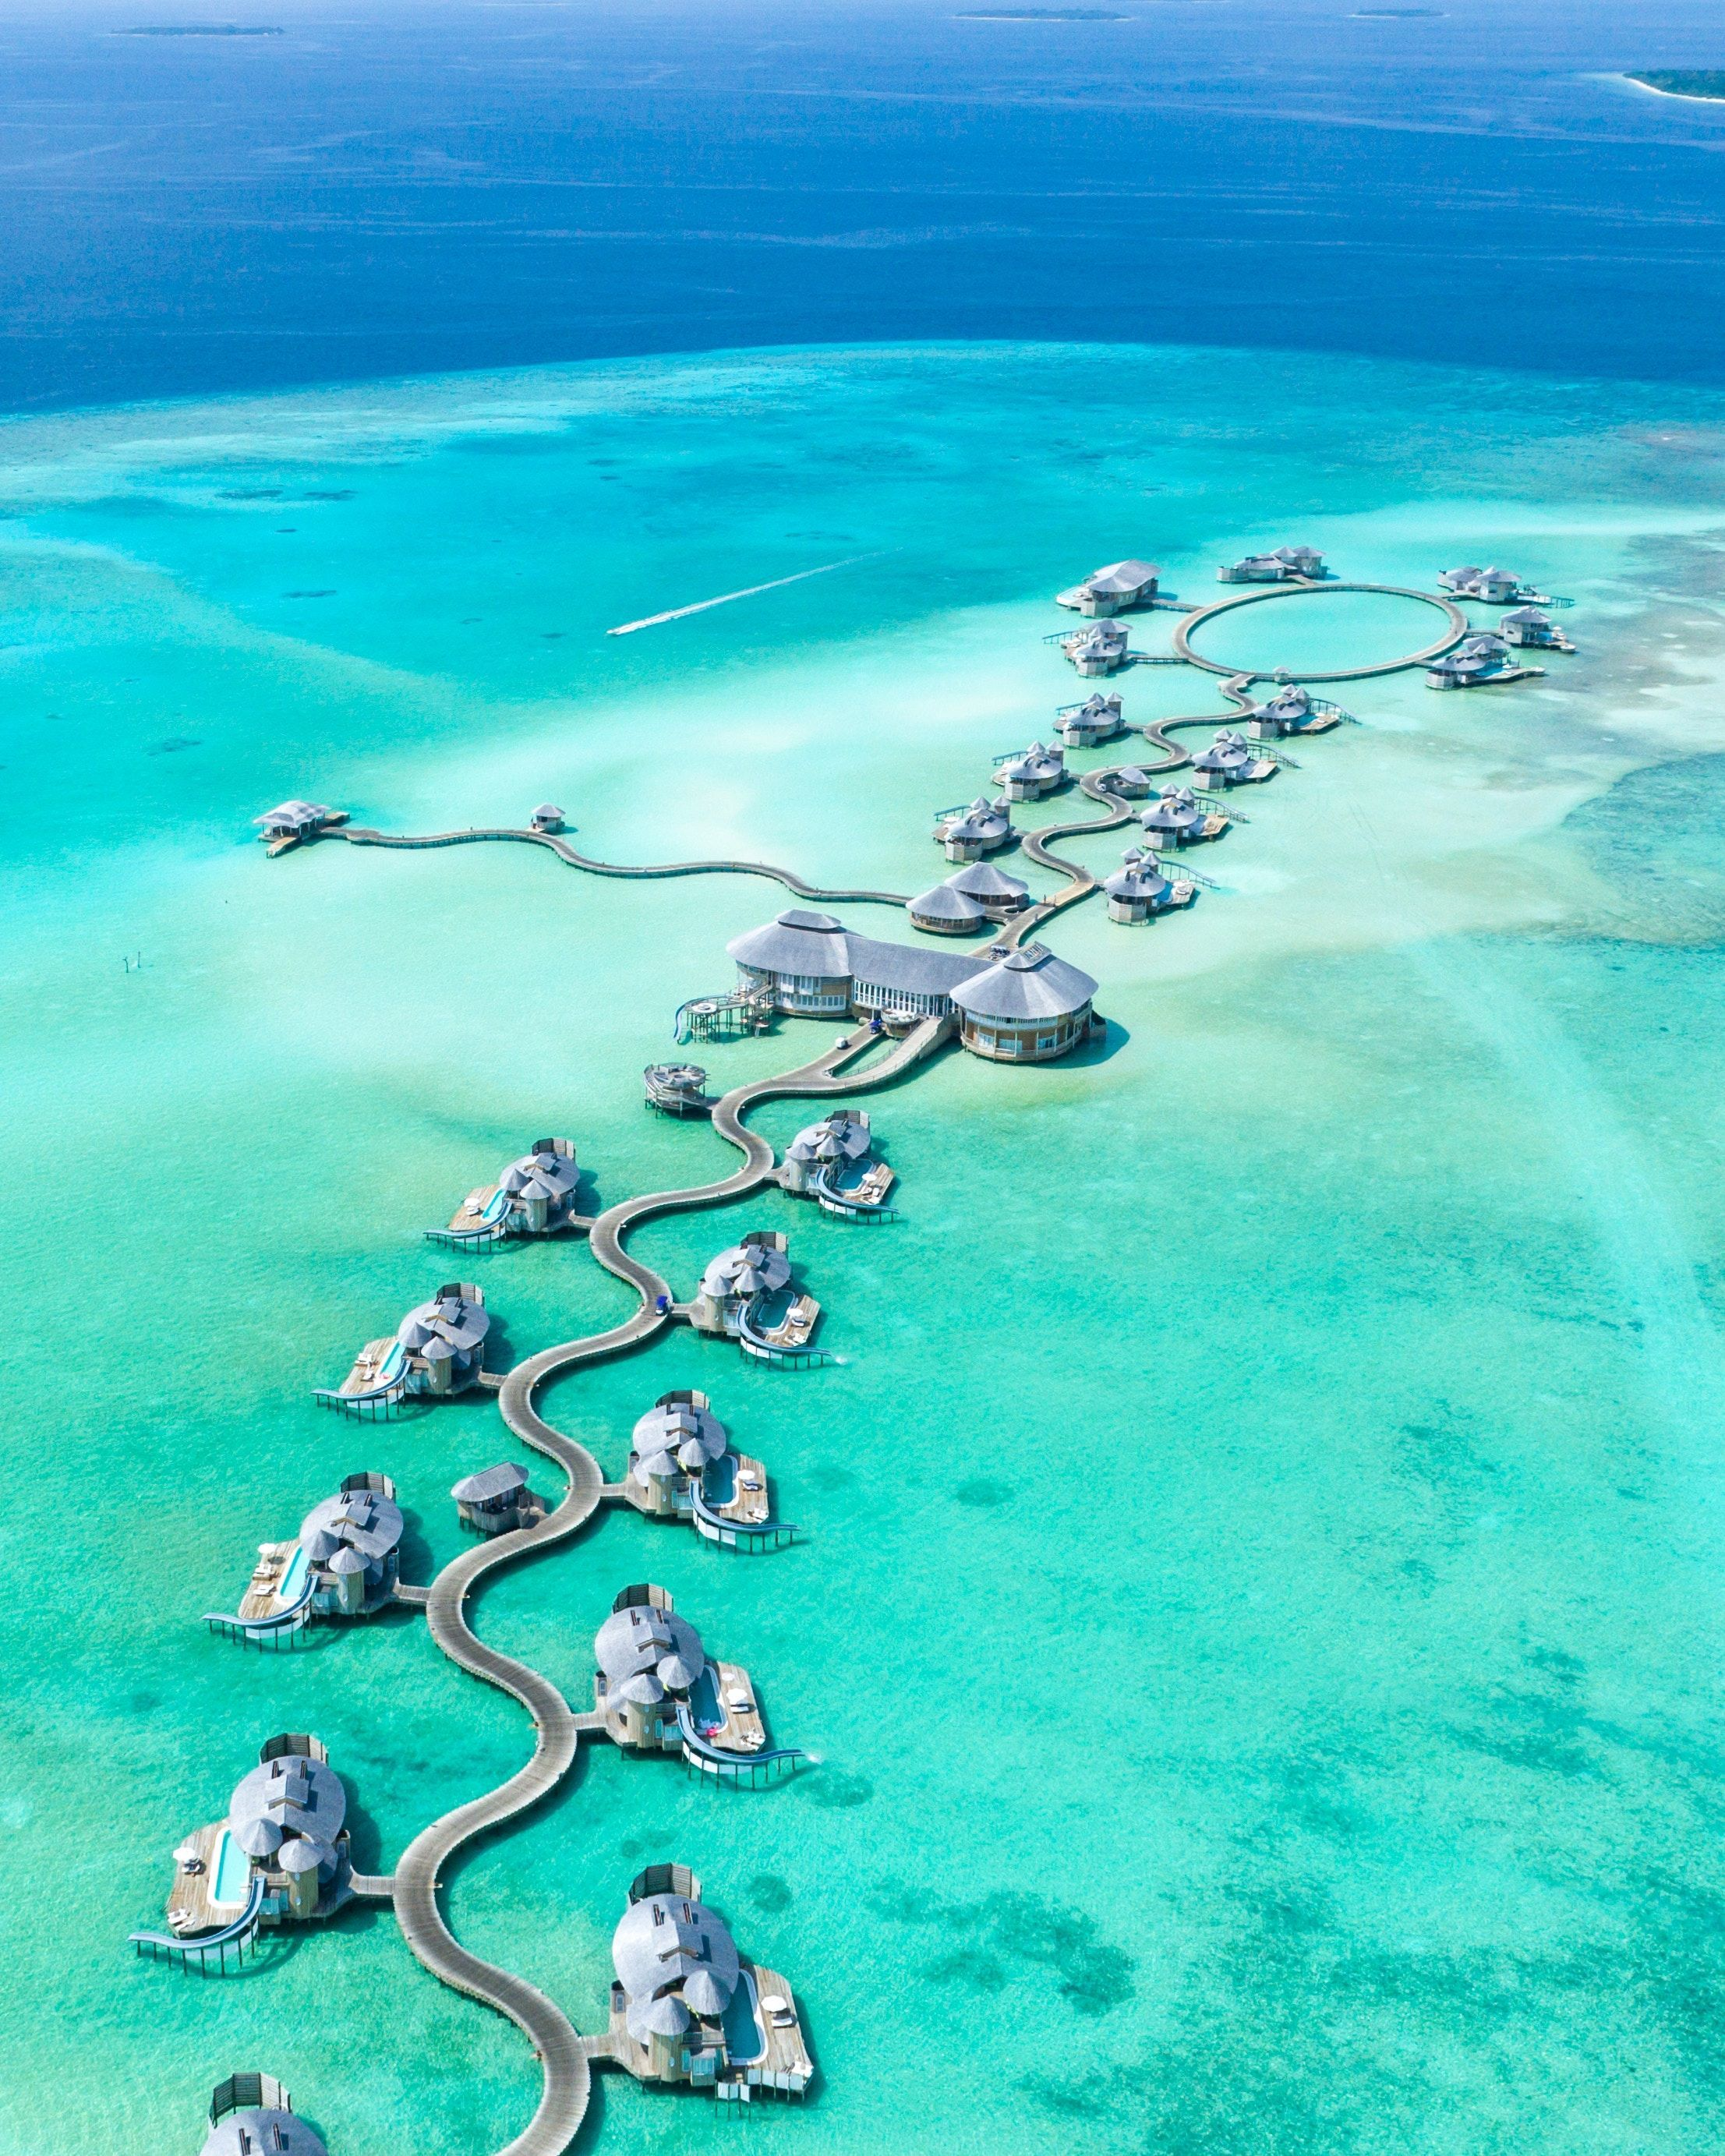 Soneva Jani, Noonu Atoll, Maldives. #VisitMaldives